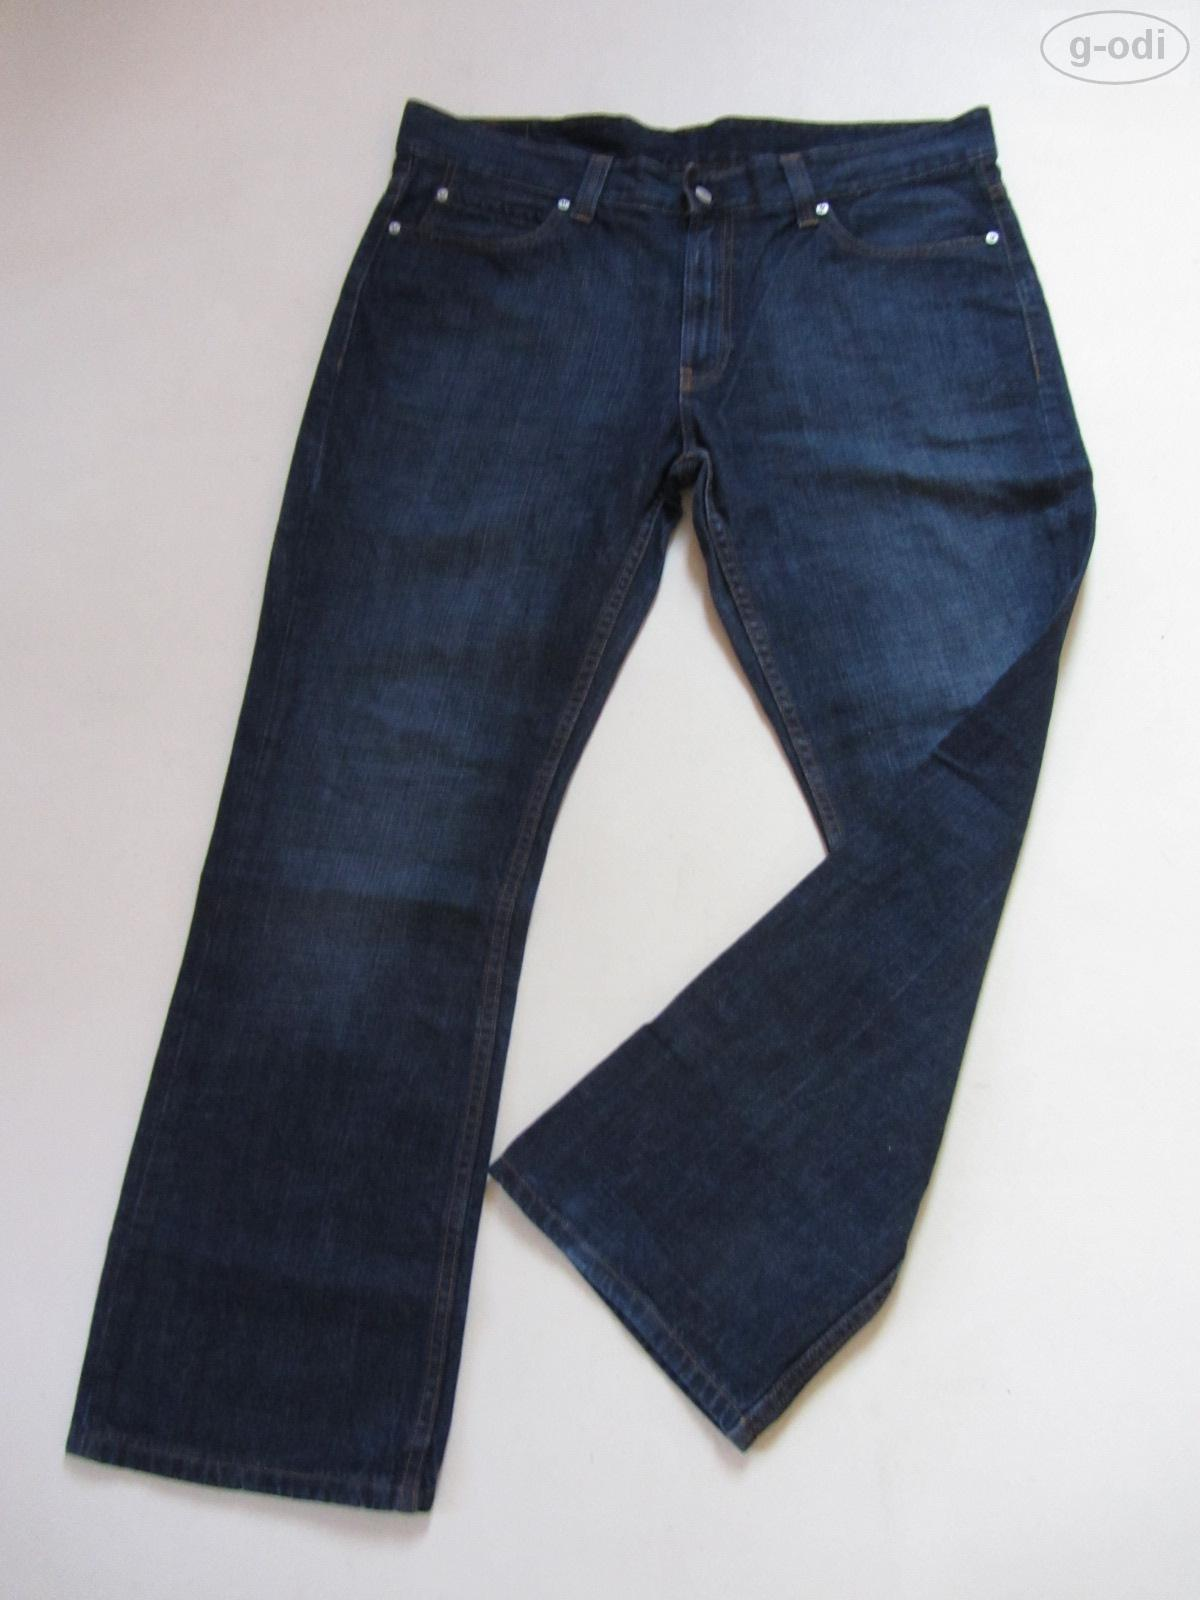 c1d3f2f15920 Levis® Levis 506 Herren Jeans, 40  32 TOP W40 L32, standard fit on ...